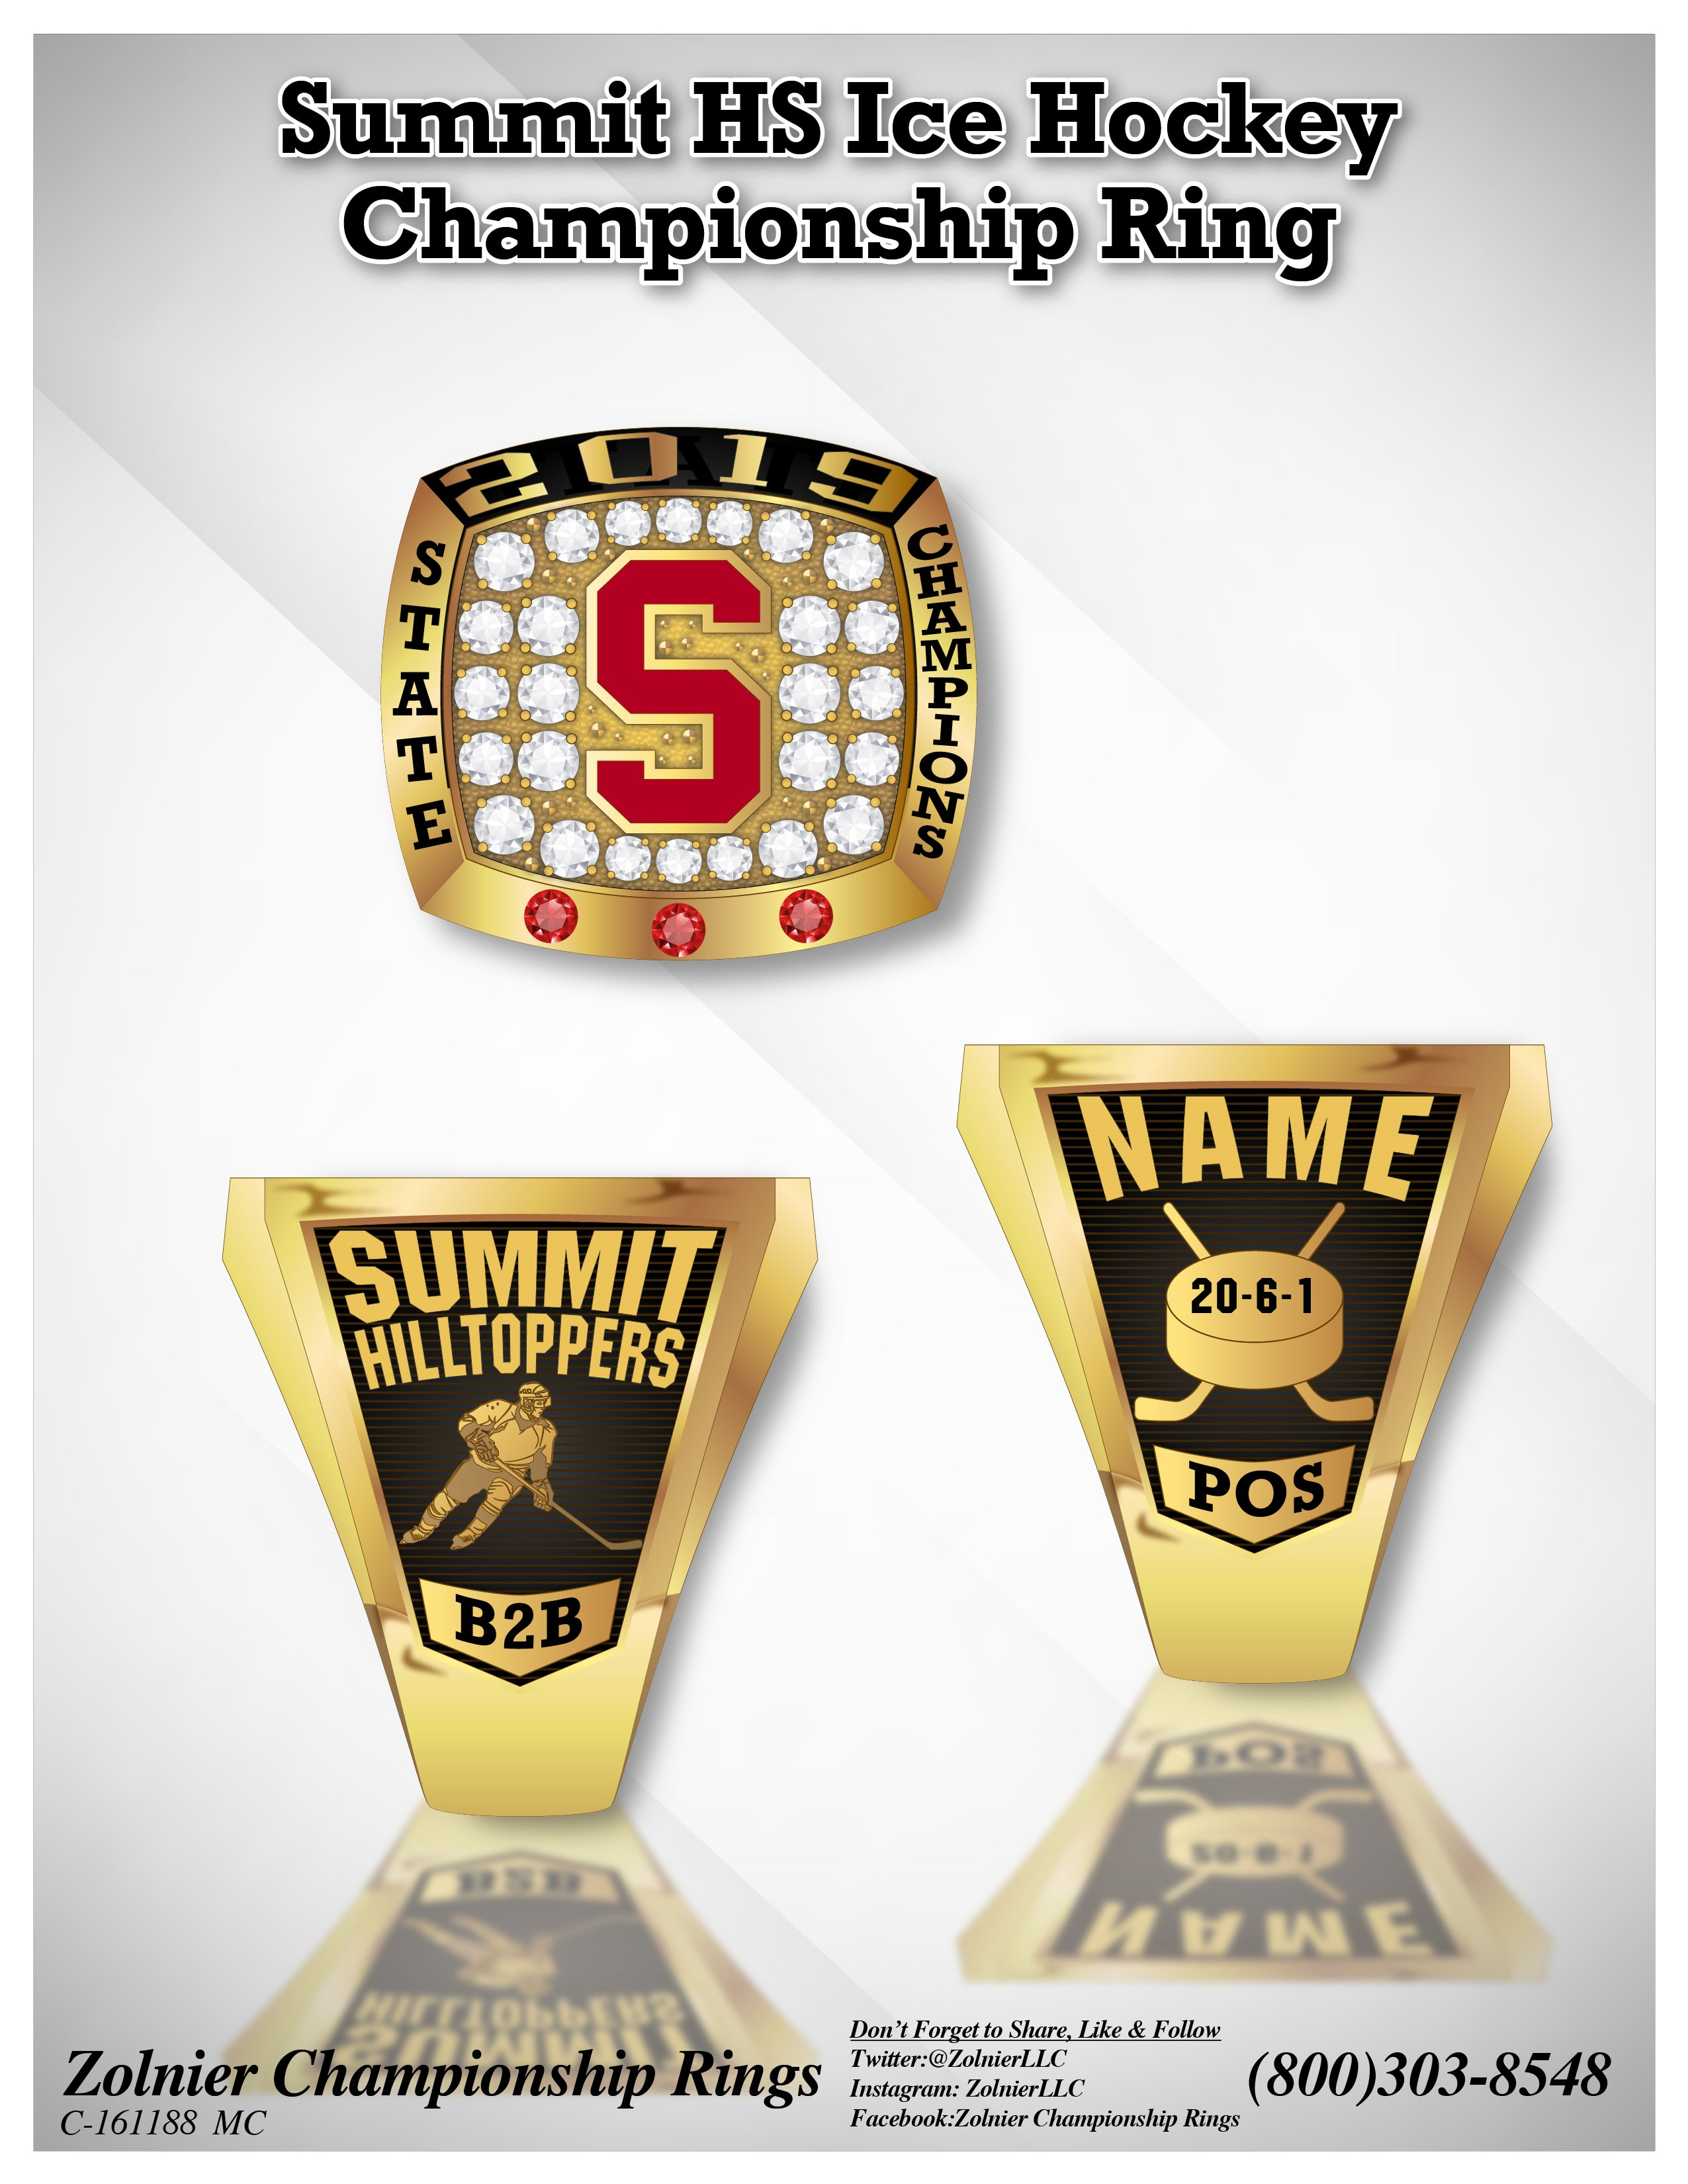 C-161188 Summit HS Ice Hocky Champ Ring